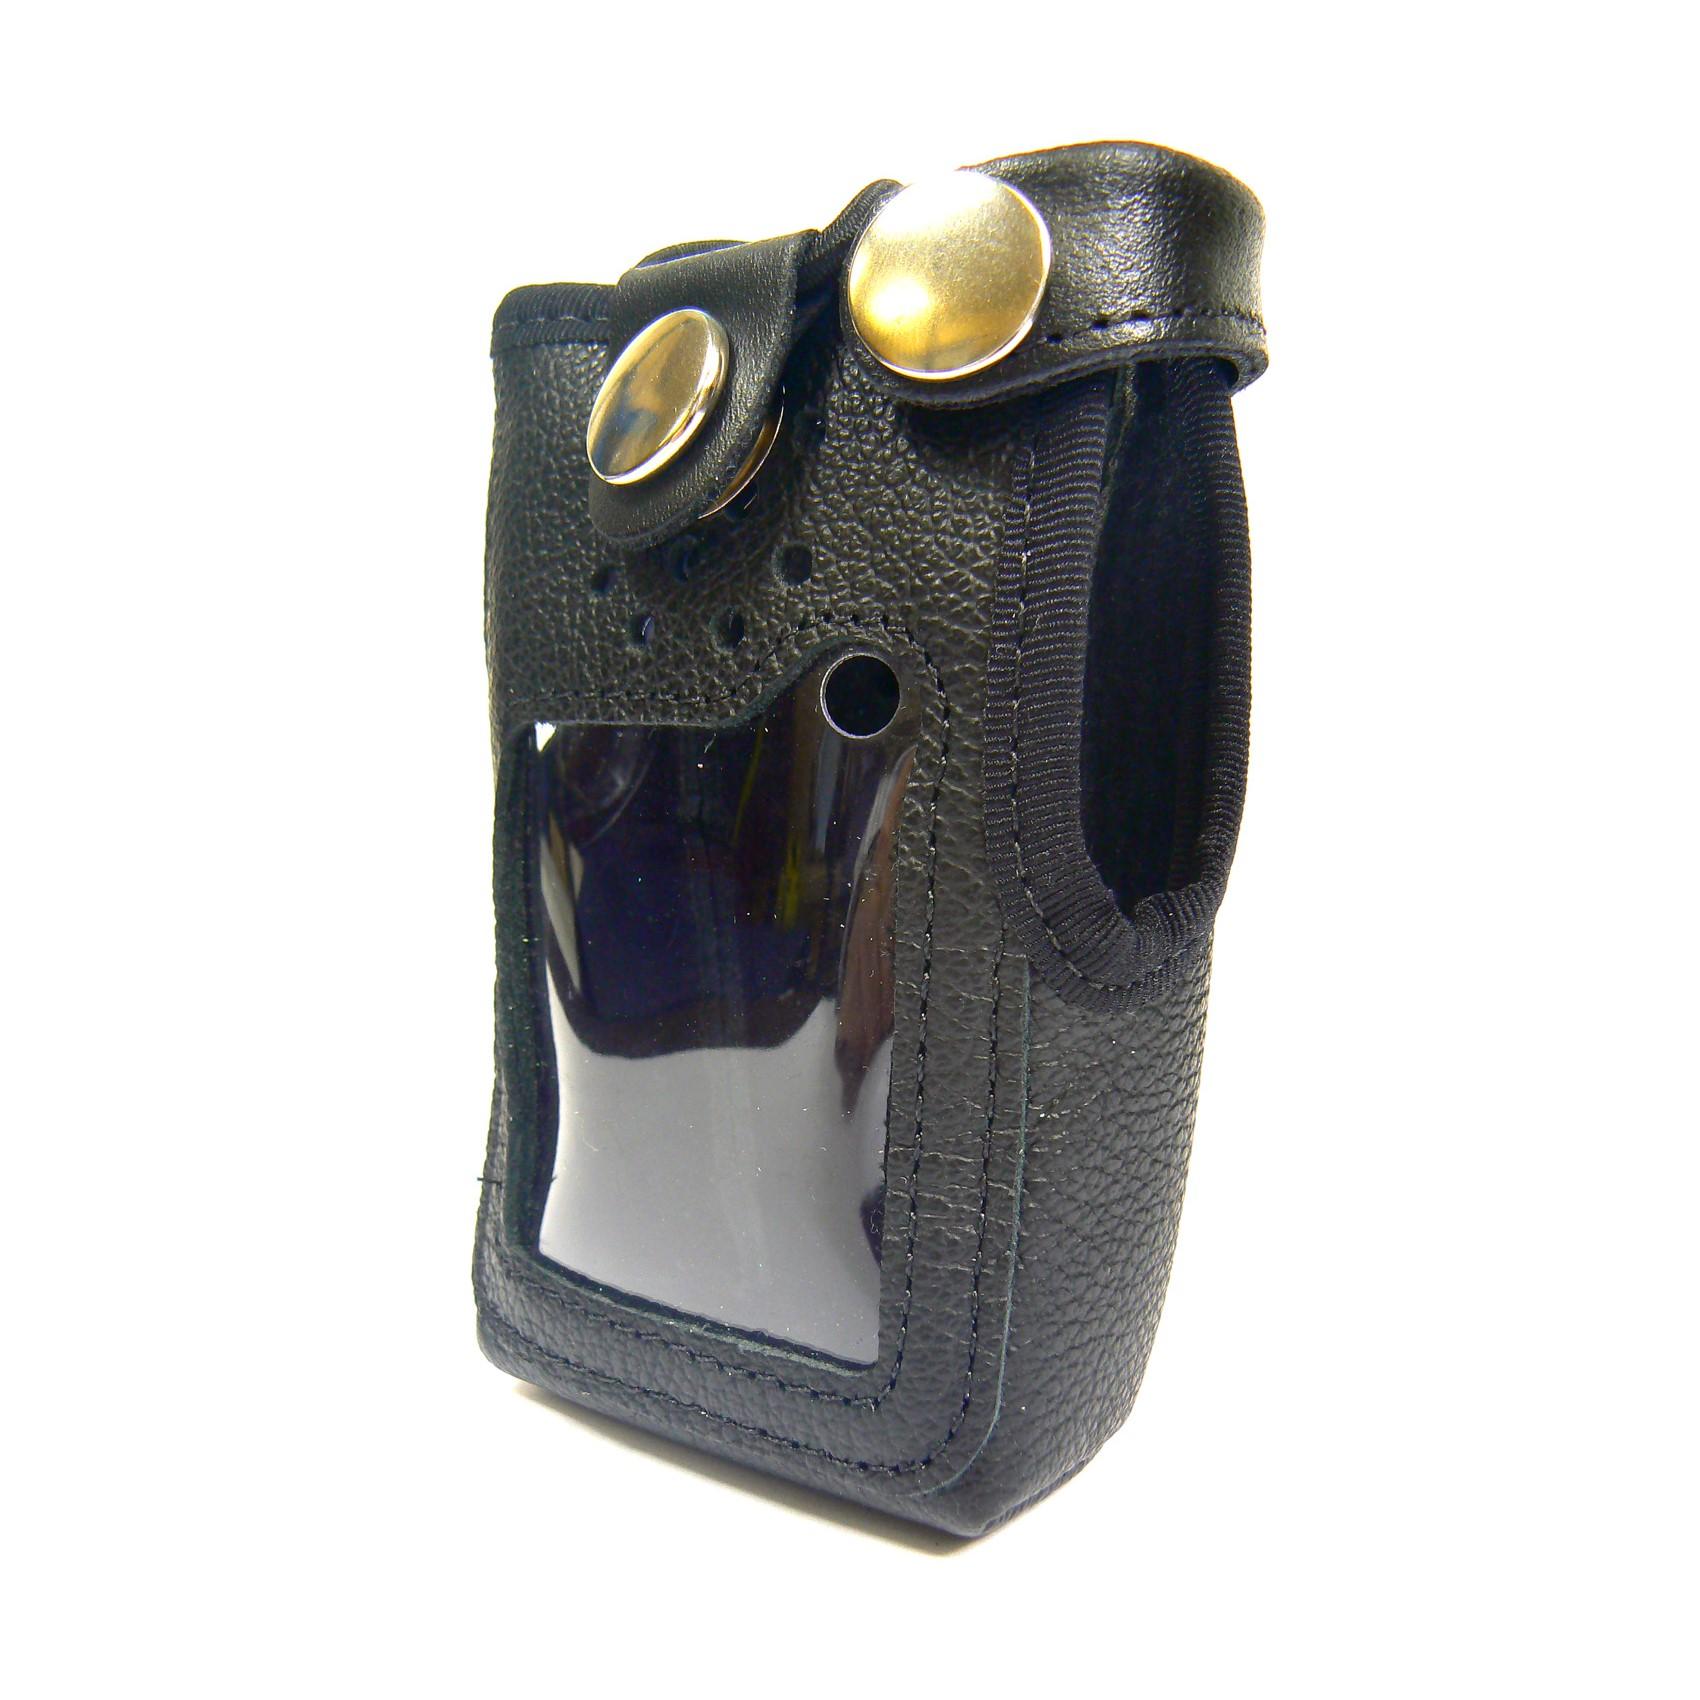 Icom M87 Radio Case Leather with clip